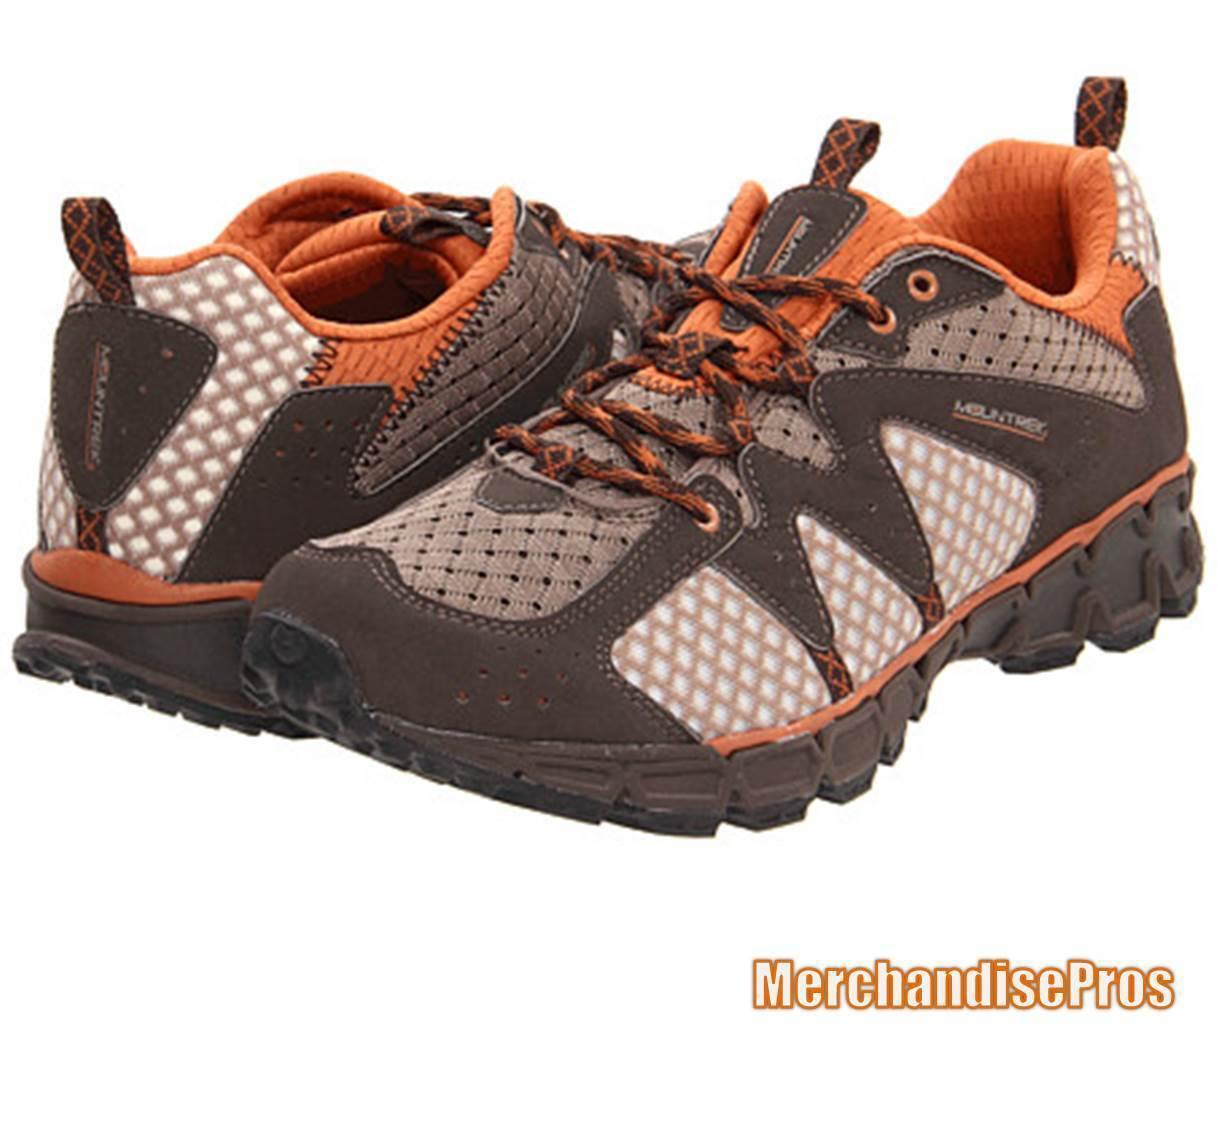 Herren MOUNTREK HORIZON TRAIL Schuhe RUNNING Schuhe TRAIL braun/Orange 11M MEDIUM  NEW 4e6096